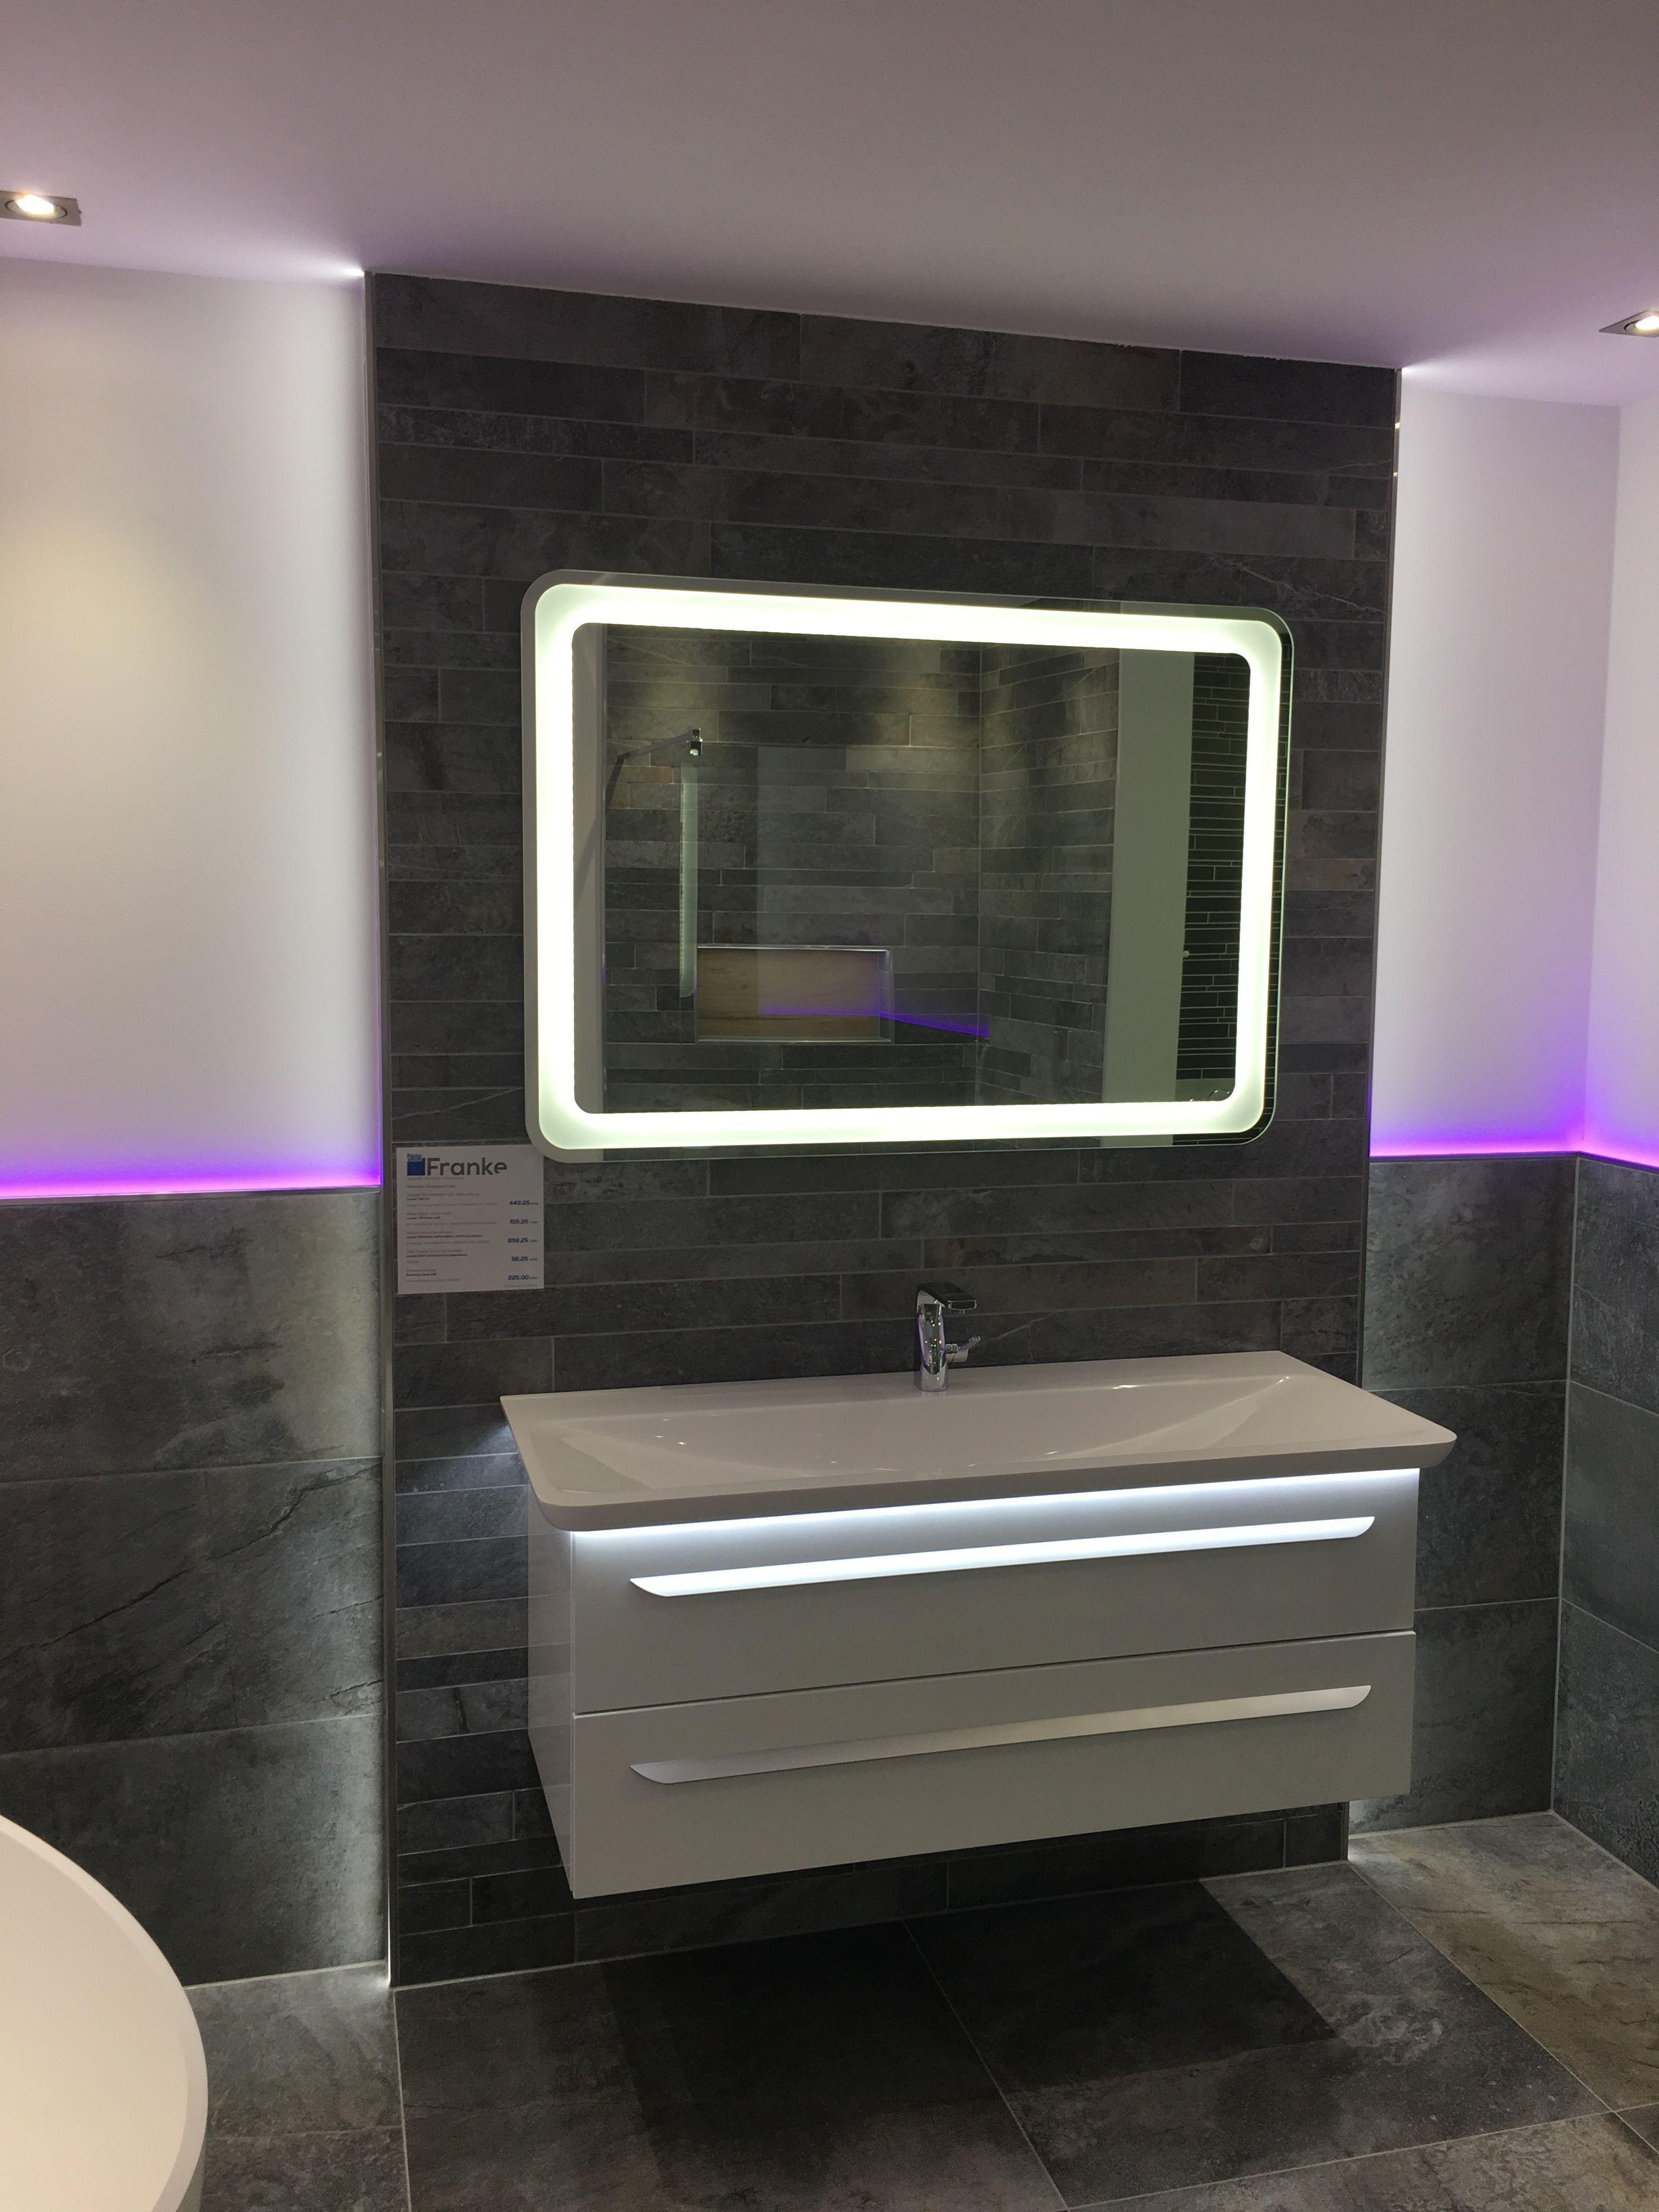 Badezimmer Badezimmerdekoration Dekobadezimmer In 2020 Small Apartment Decorating Diy Small Apartment Small Bathroom Decor